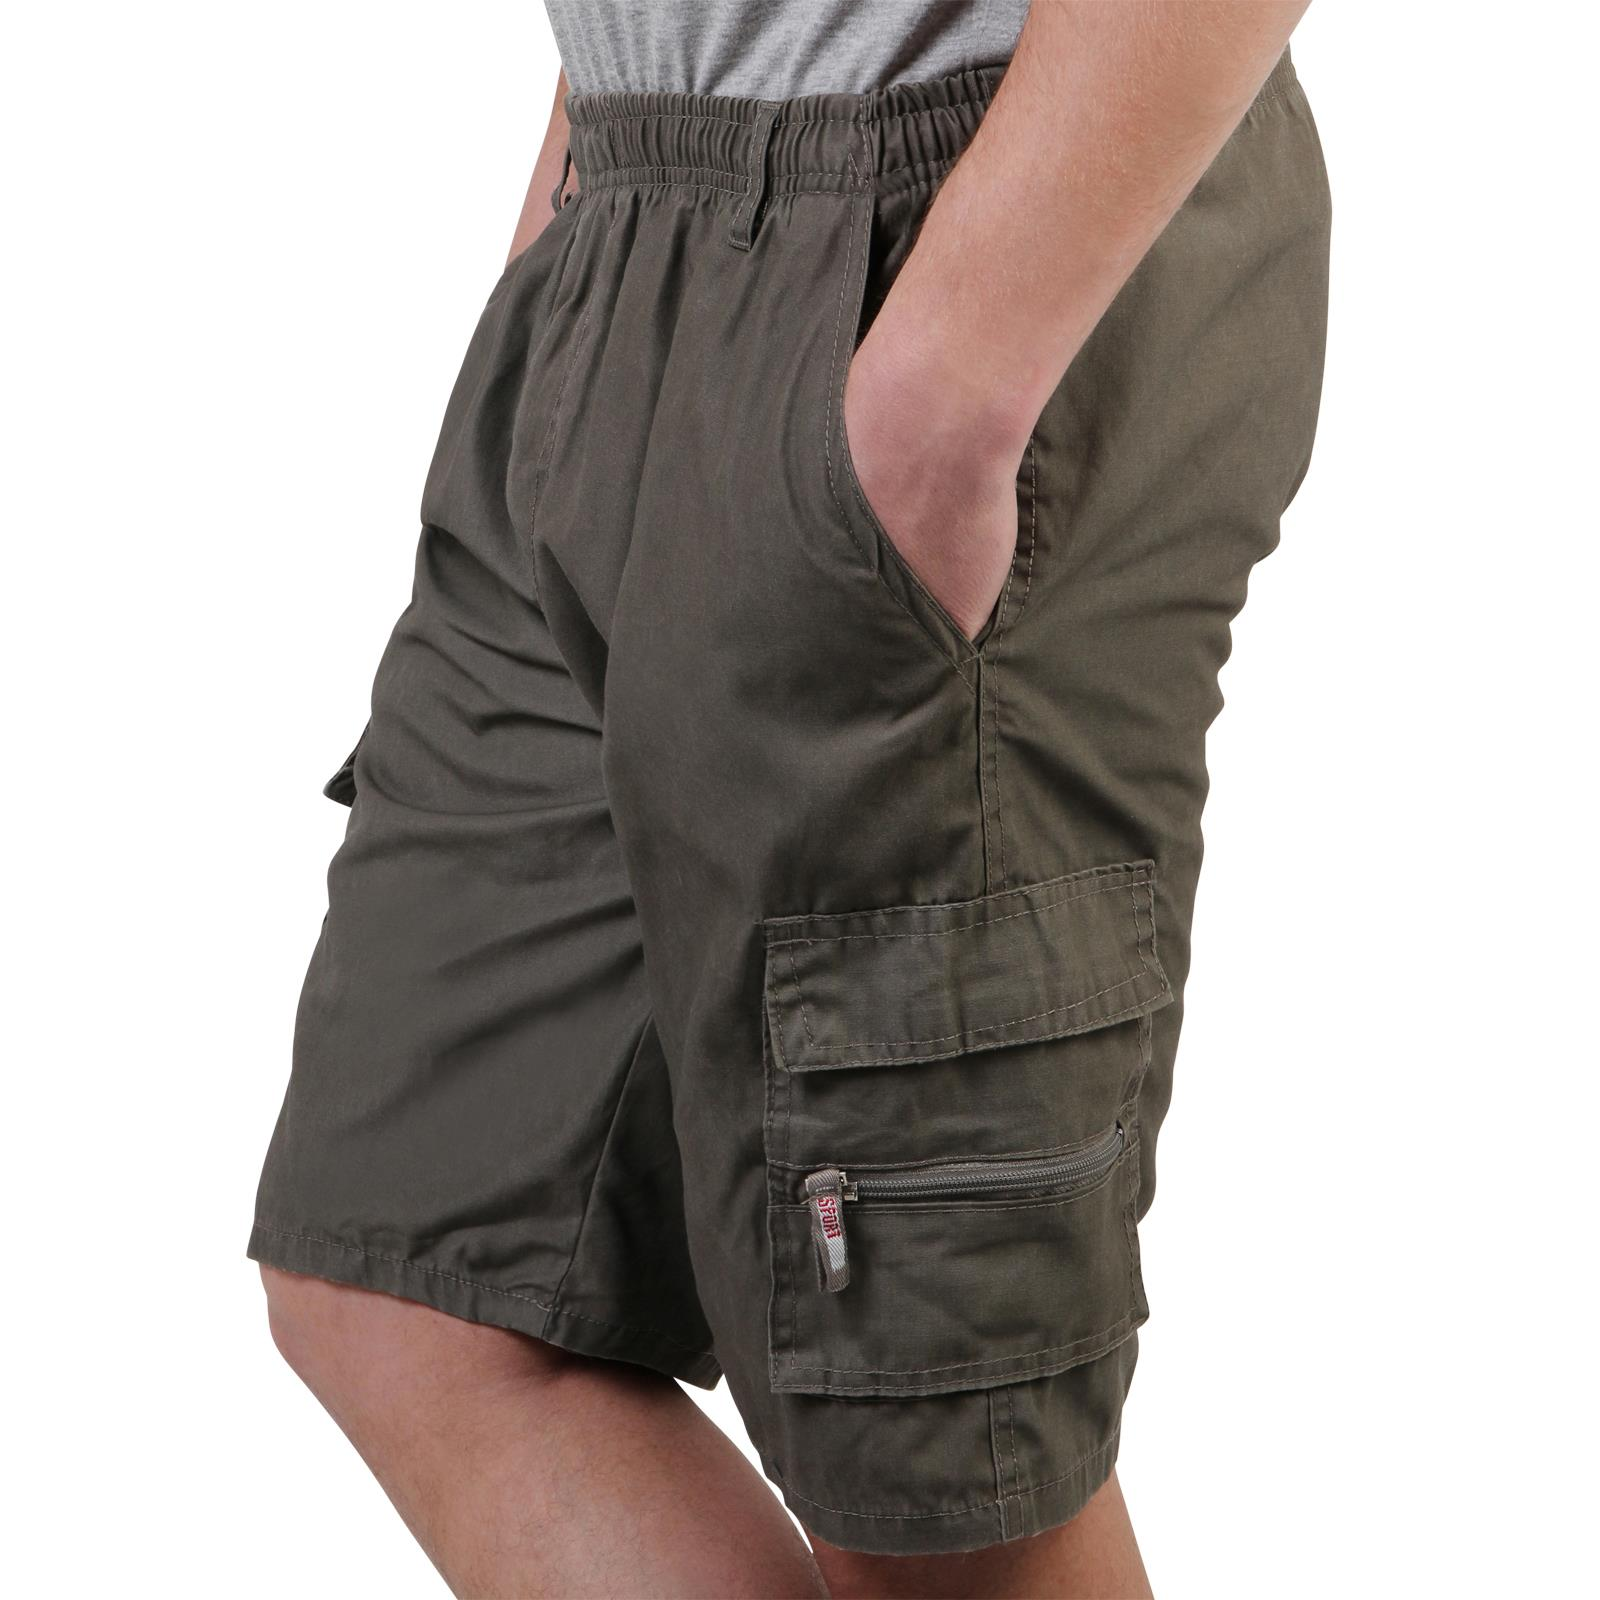 Mens-Cotton-Cargo-Shorts-Plain-Basic-Casual-Work-Chinos-Combat-Pants-Regular thumbnail 17